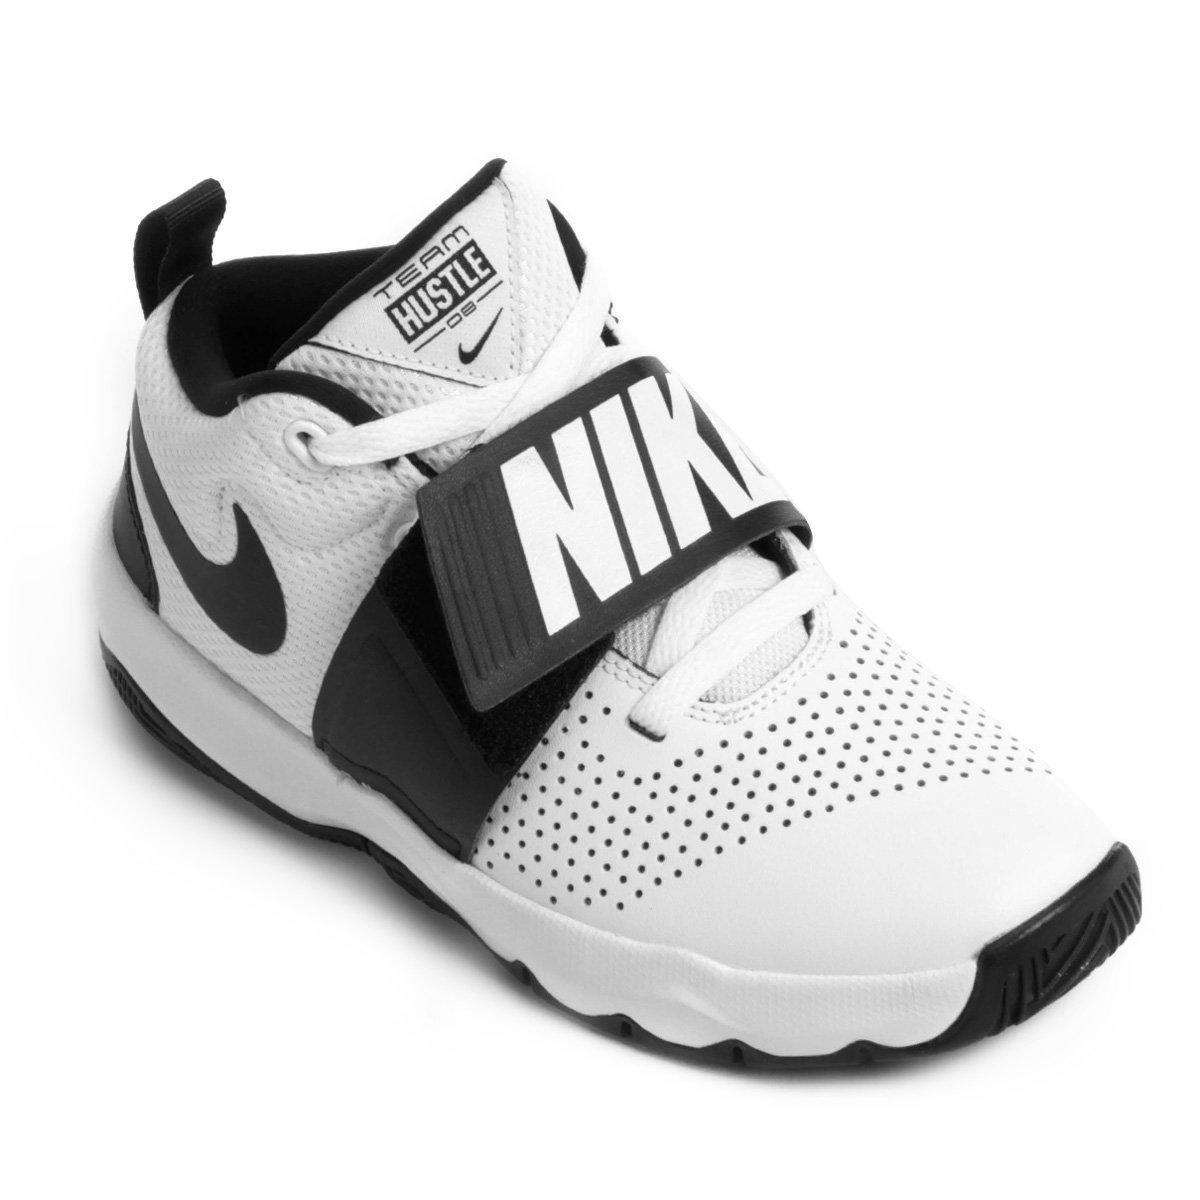 829be59bc5b Tênis Infantil Nike Team Hustle D8 Masculino